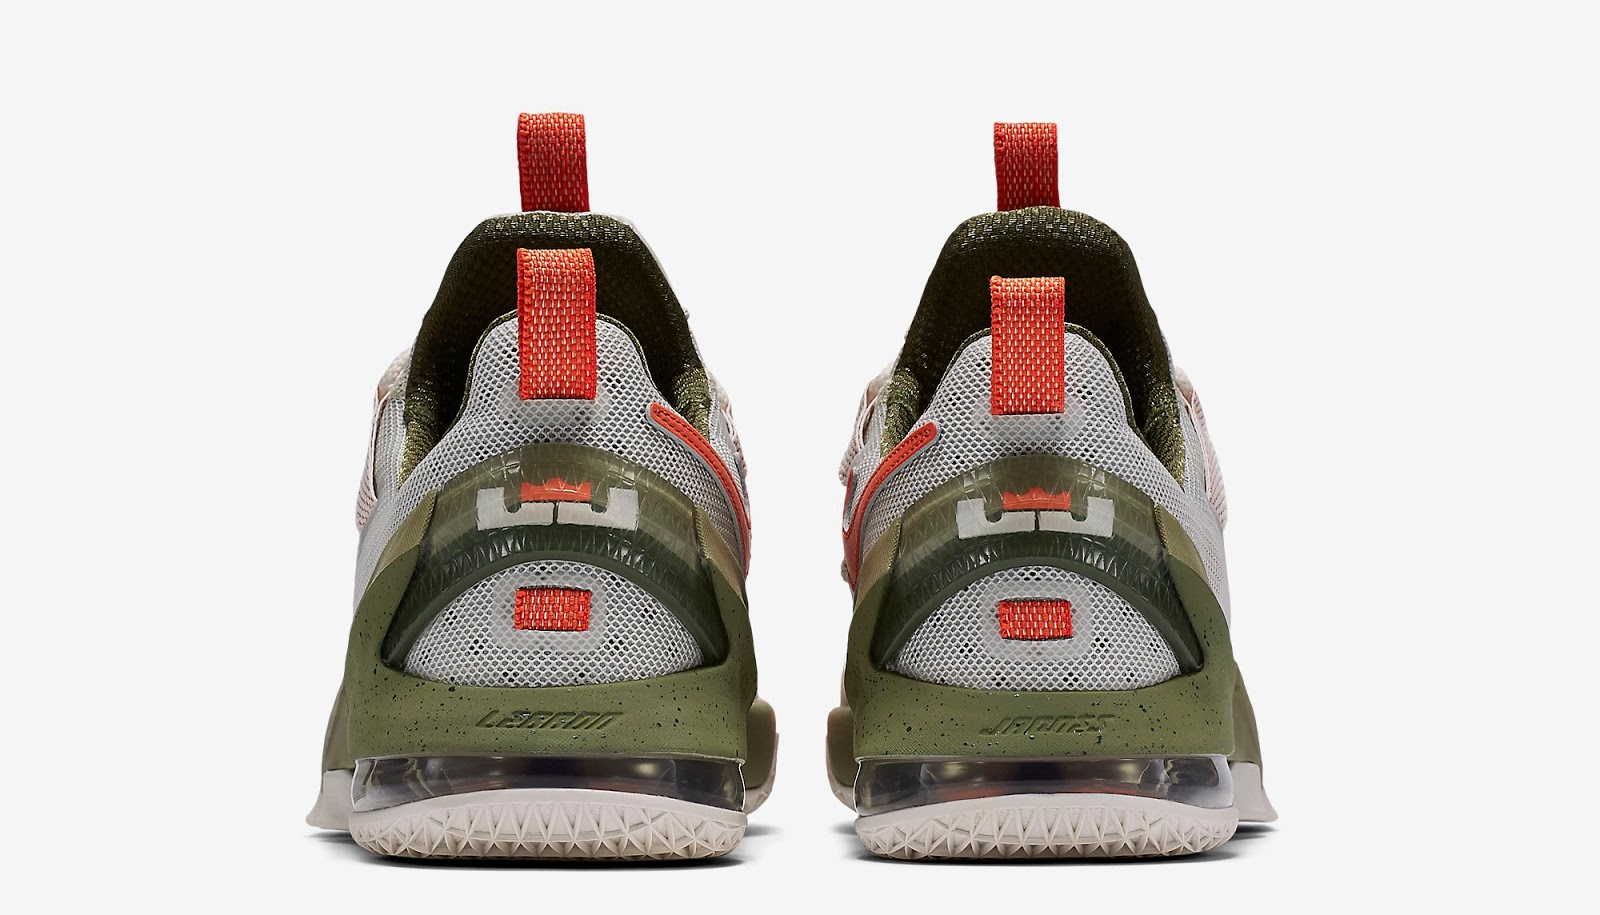 5b6feccf9078 ajordanxi Your #1 Source For Sneaker Release Dates: Nike LeBron 13 ...